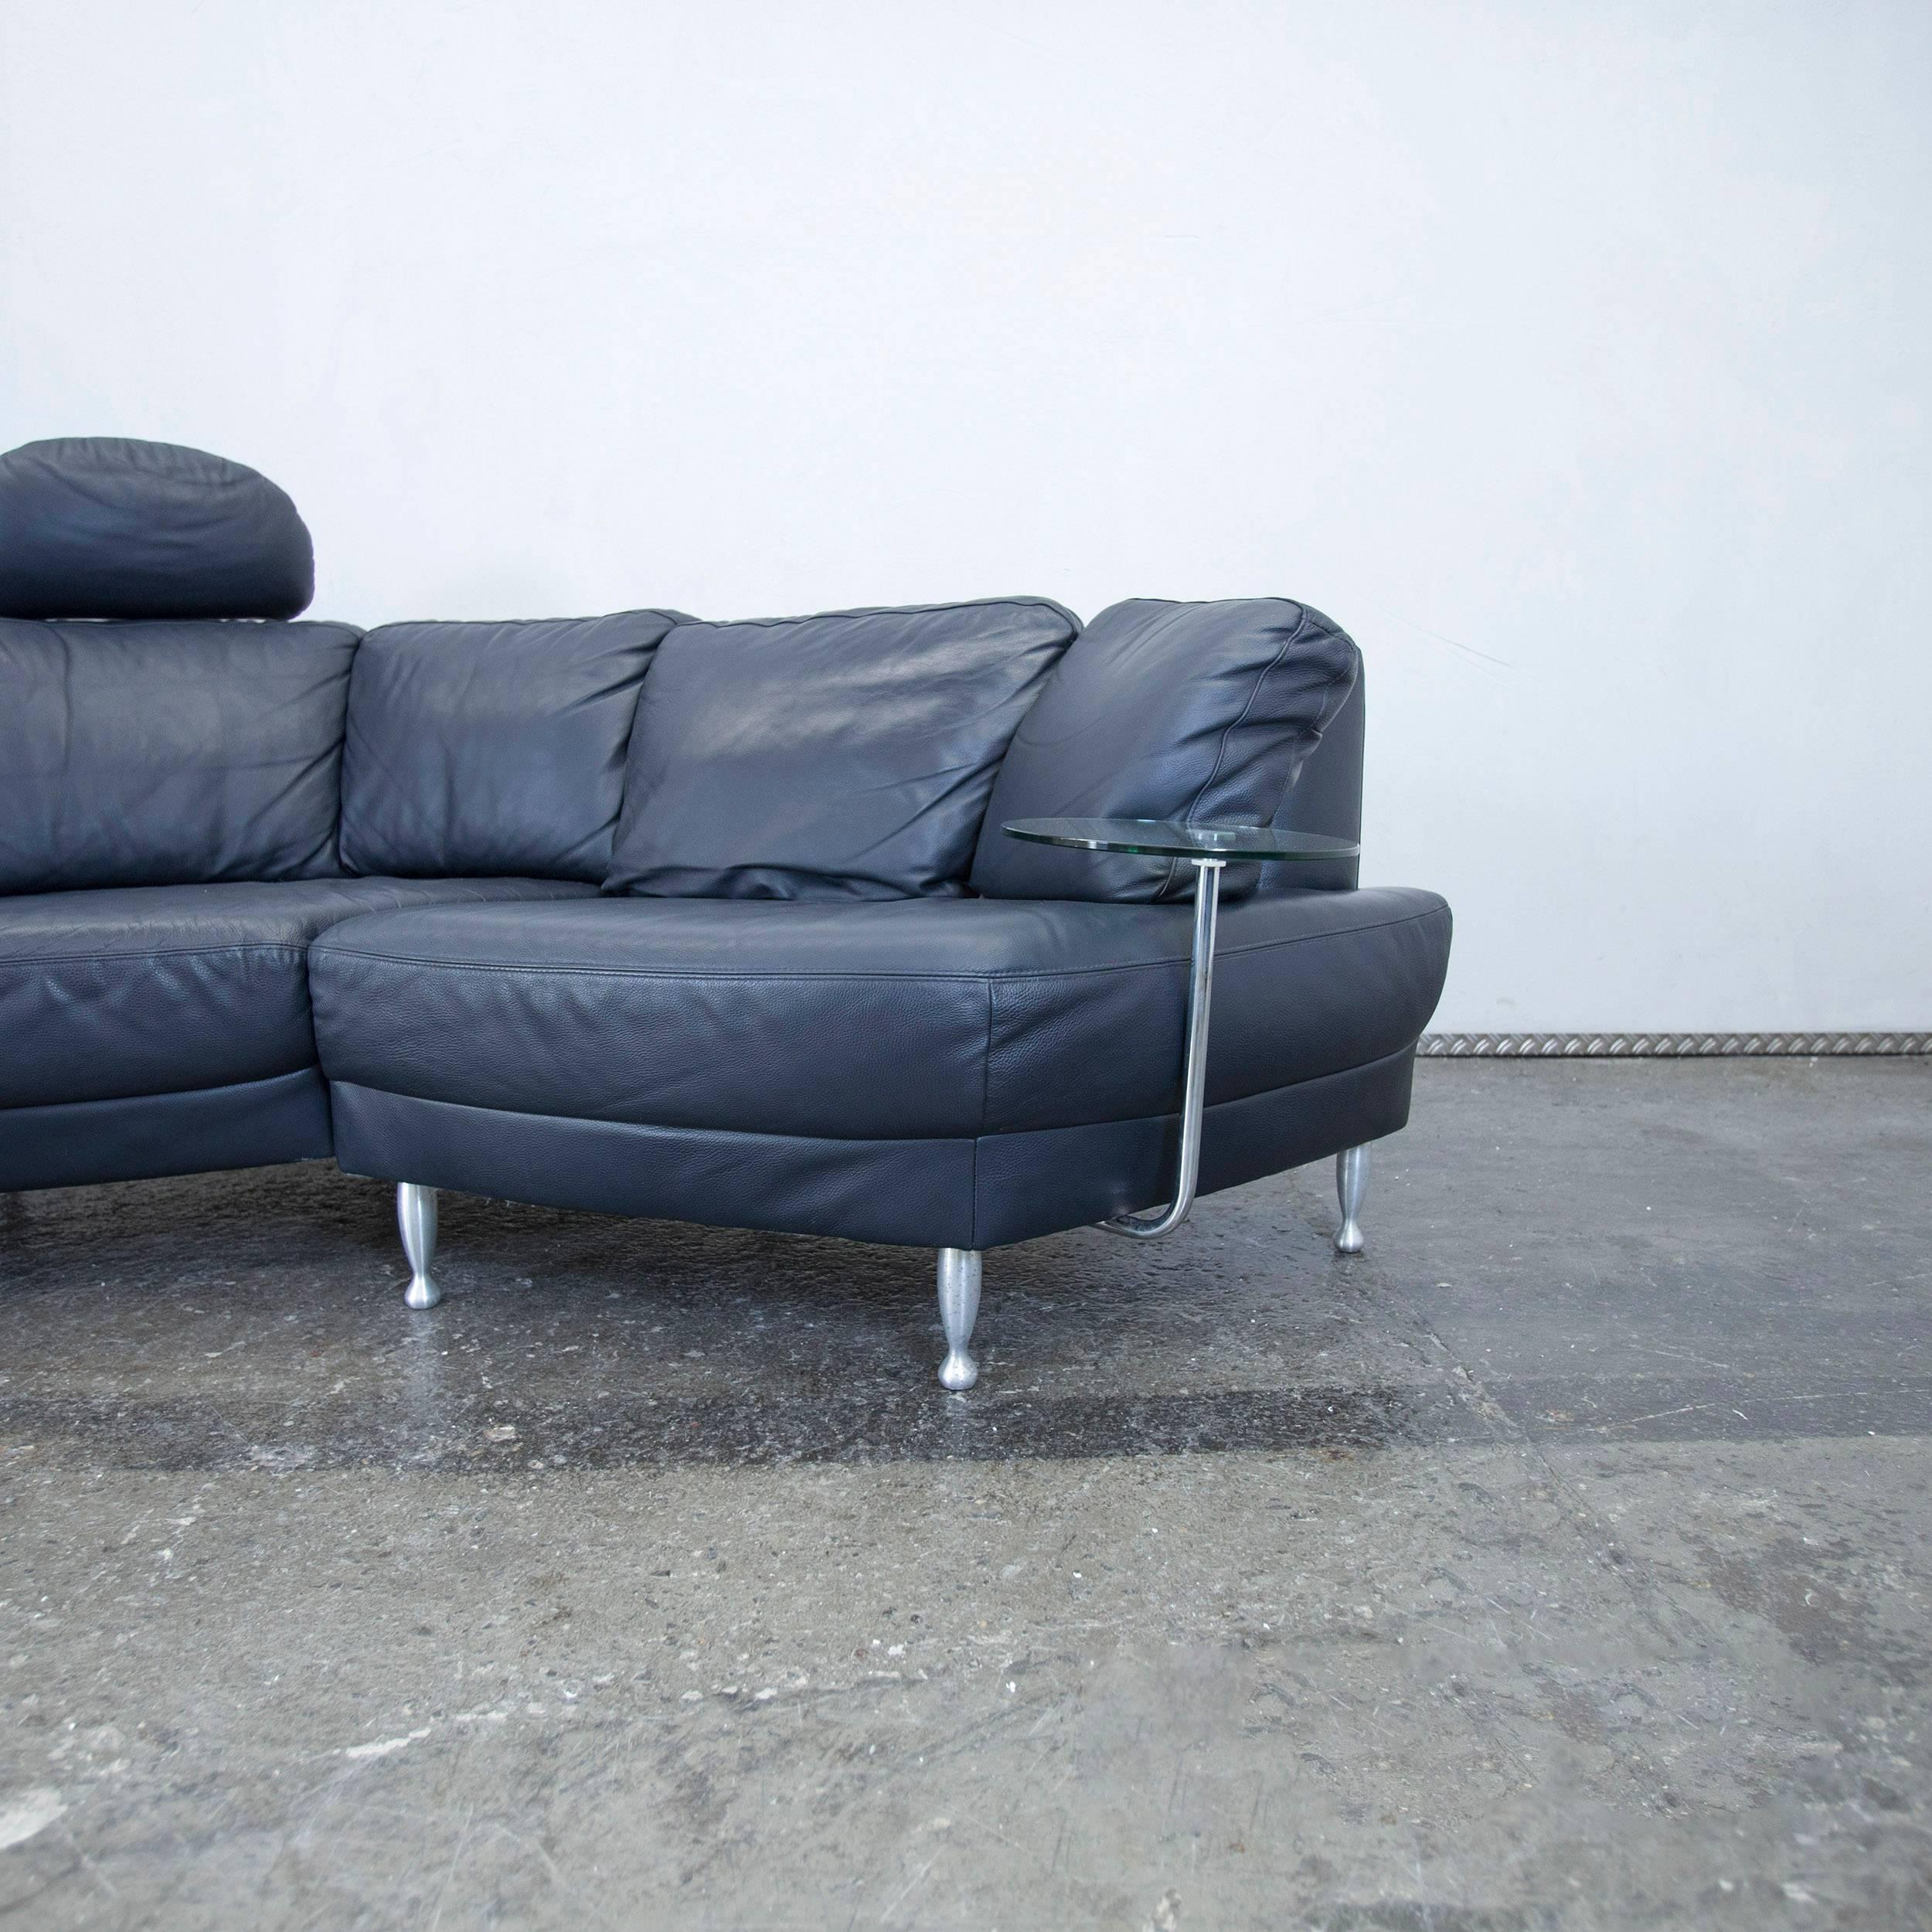 Ziemlich Multipolster Sofas Galerie - Heimat Ideen ...